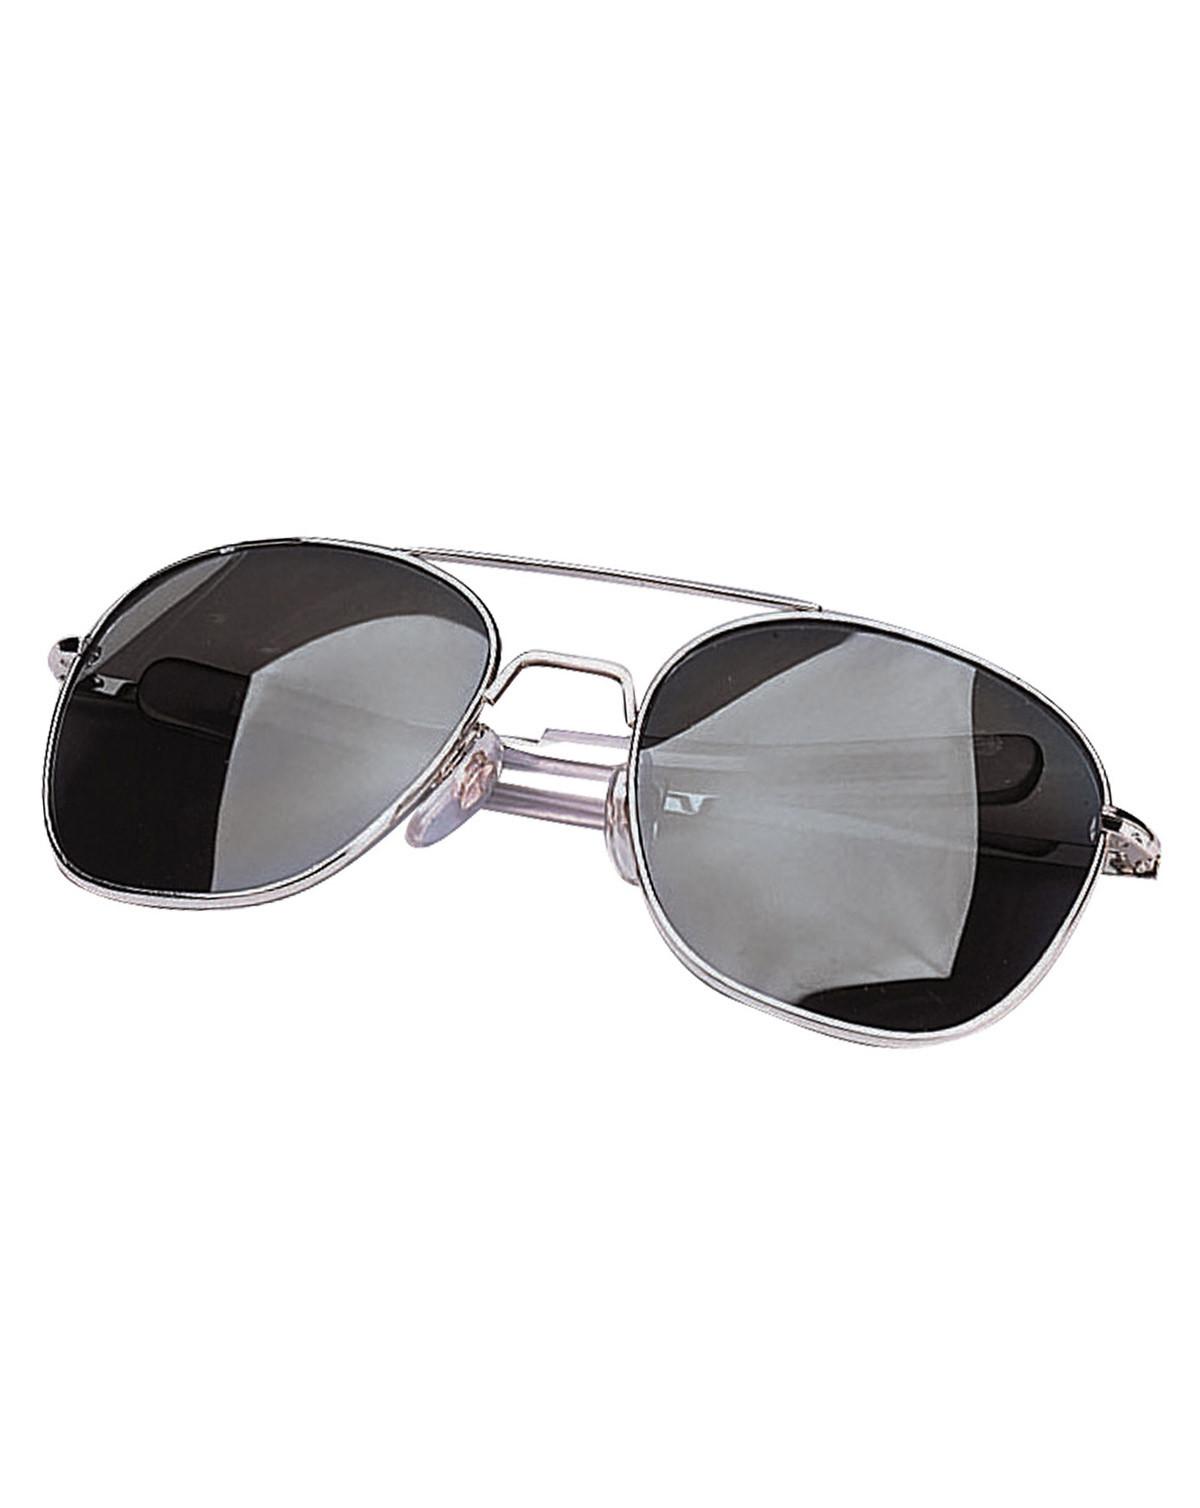 Image of   Rothco Aviator Solbriller (Krom m. Røget Glas, One Size)